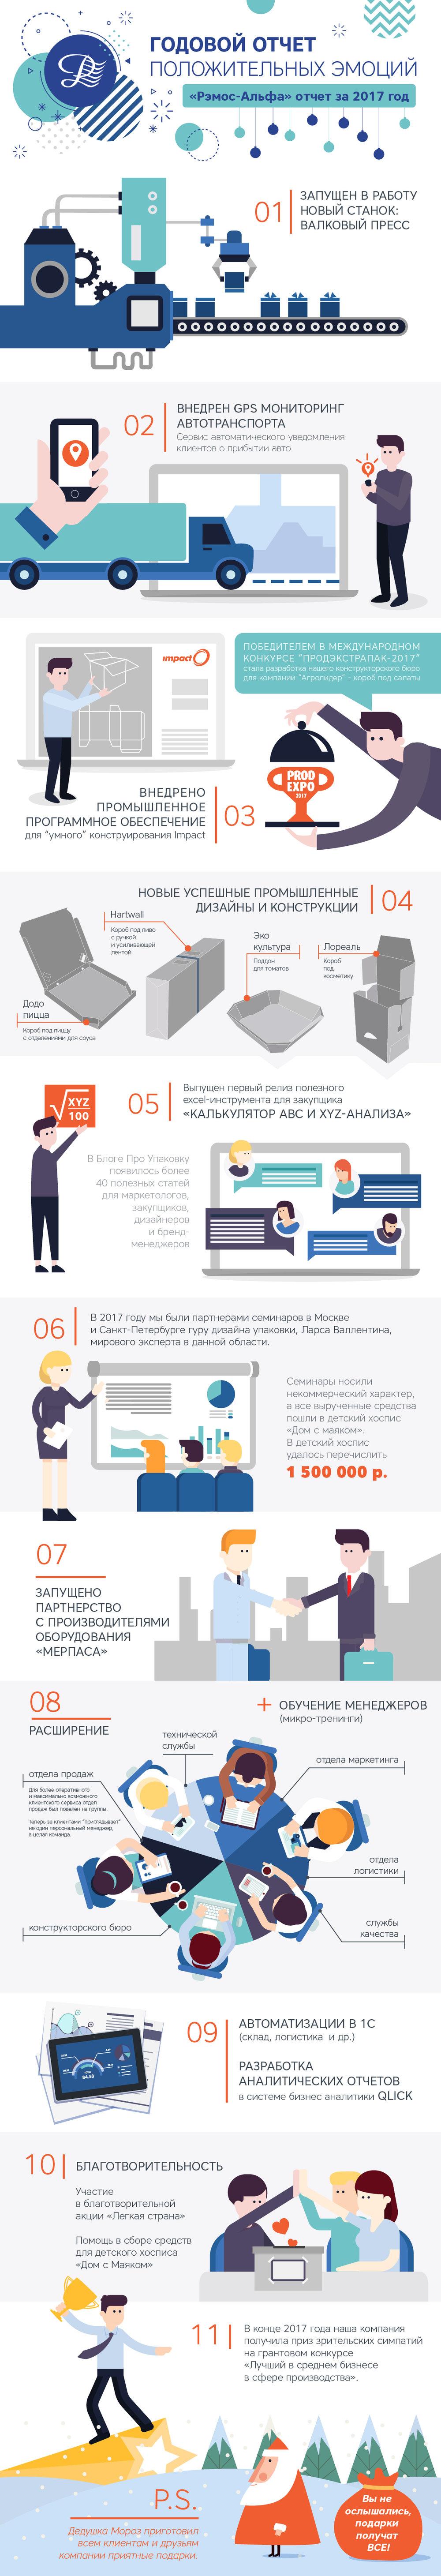 infographic_RA-01.jpg